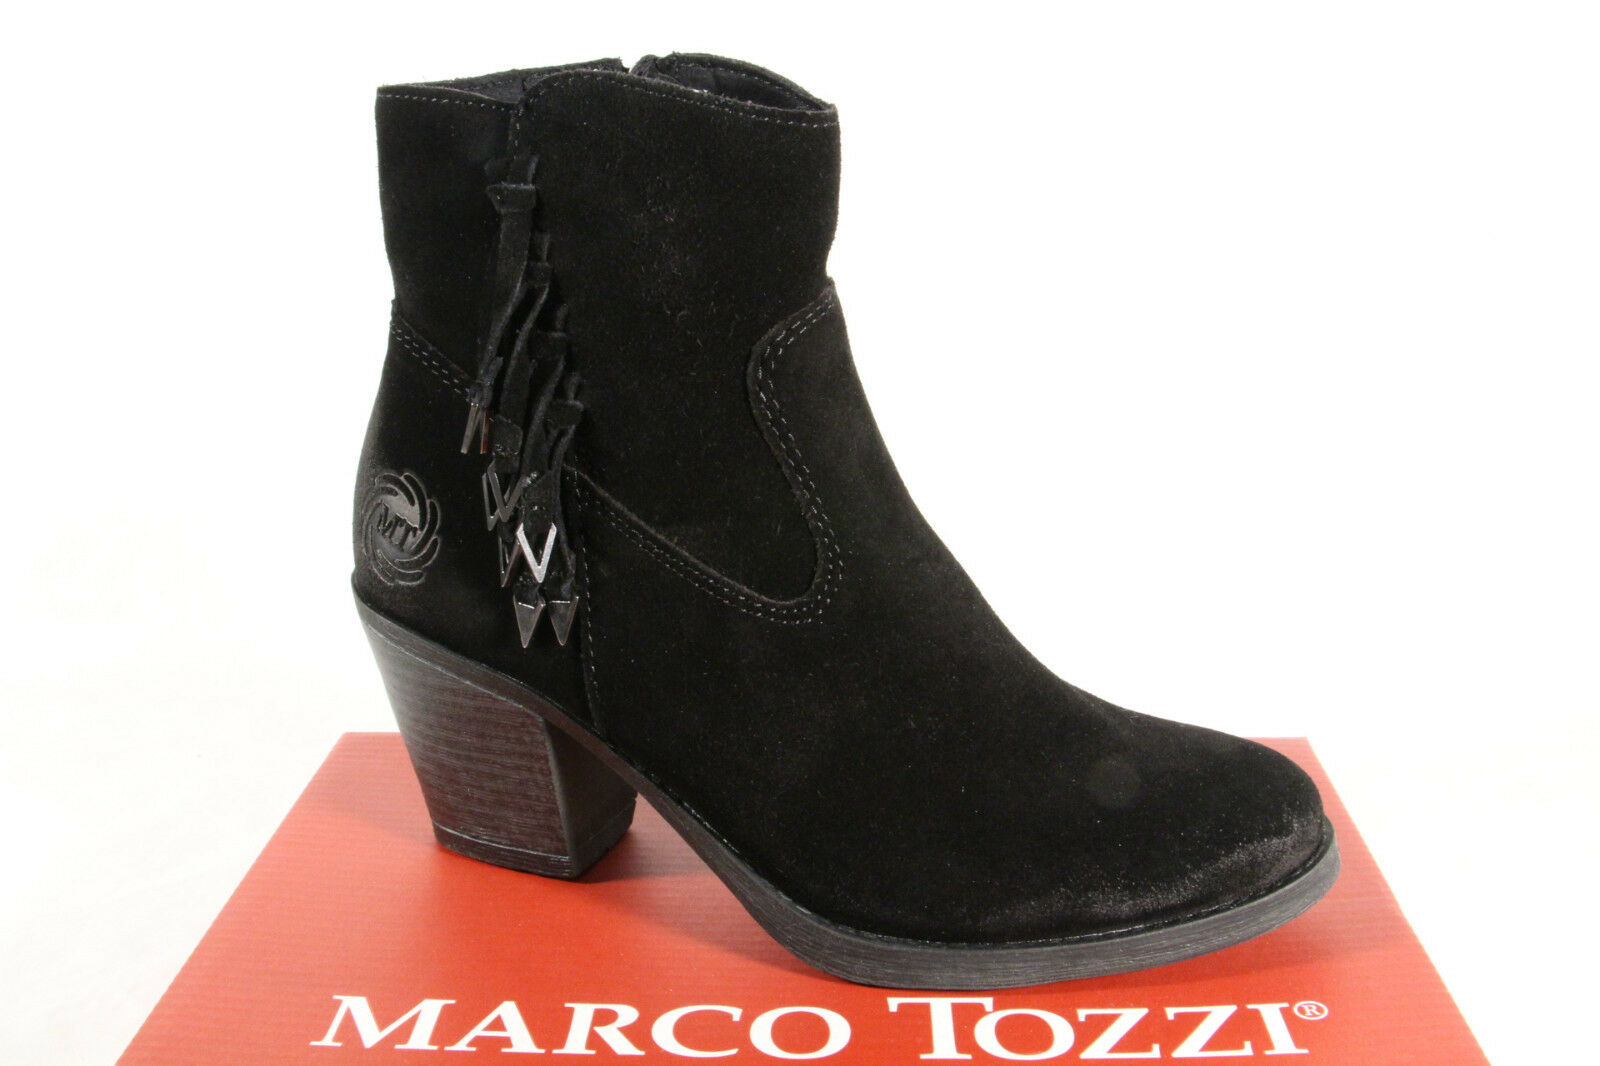 Marco Tozzi Damen Stiefel Stiefeletten 25375  Stiefel Echtleder schwarz  NEU